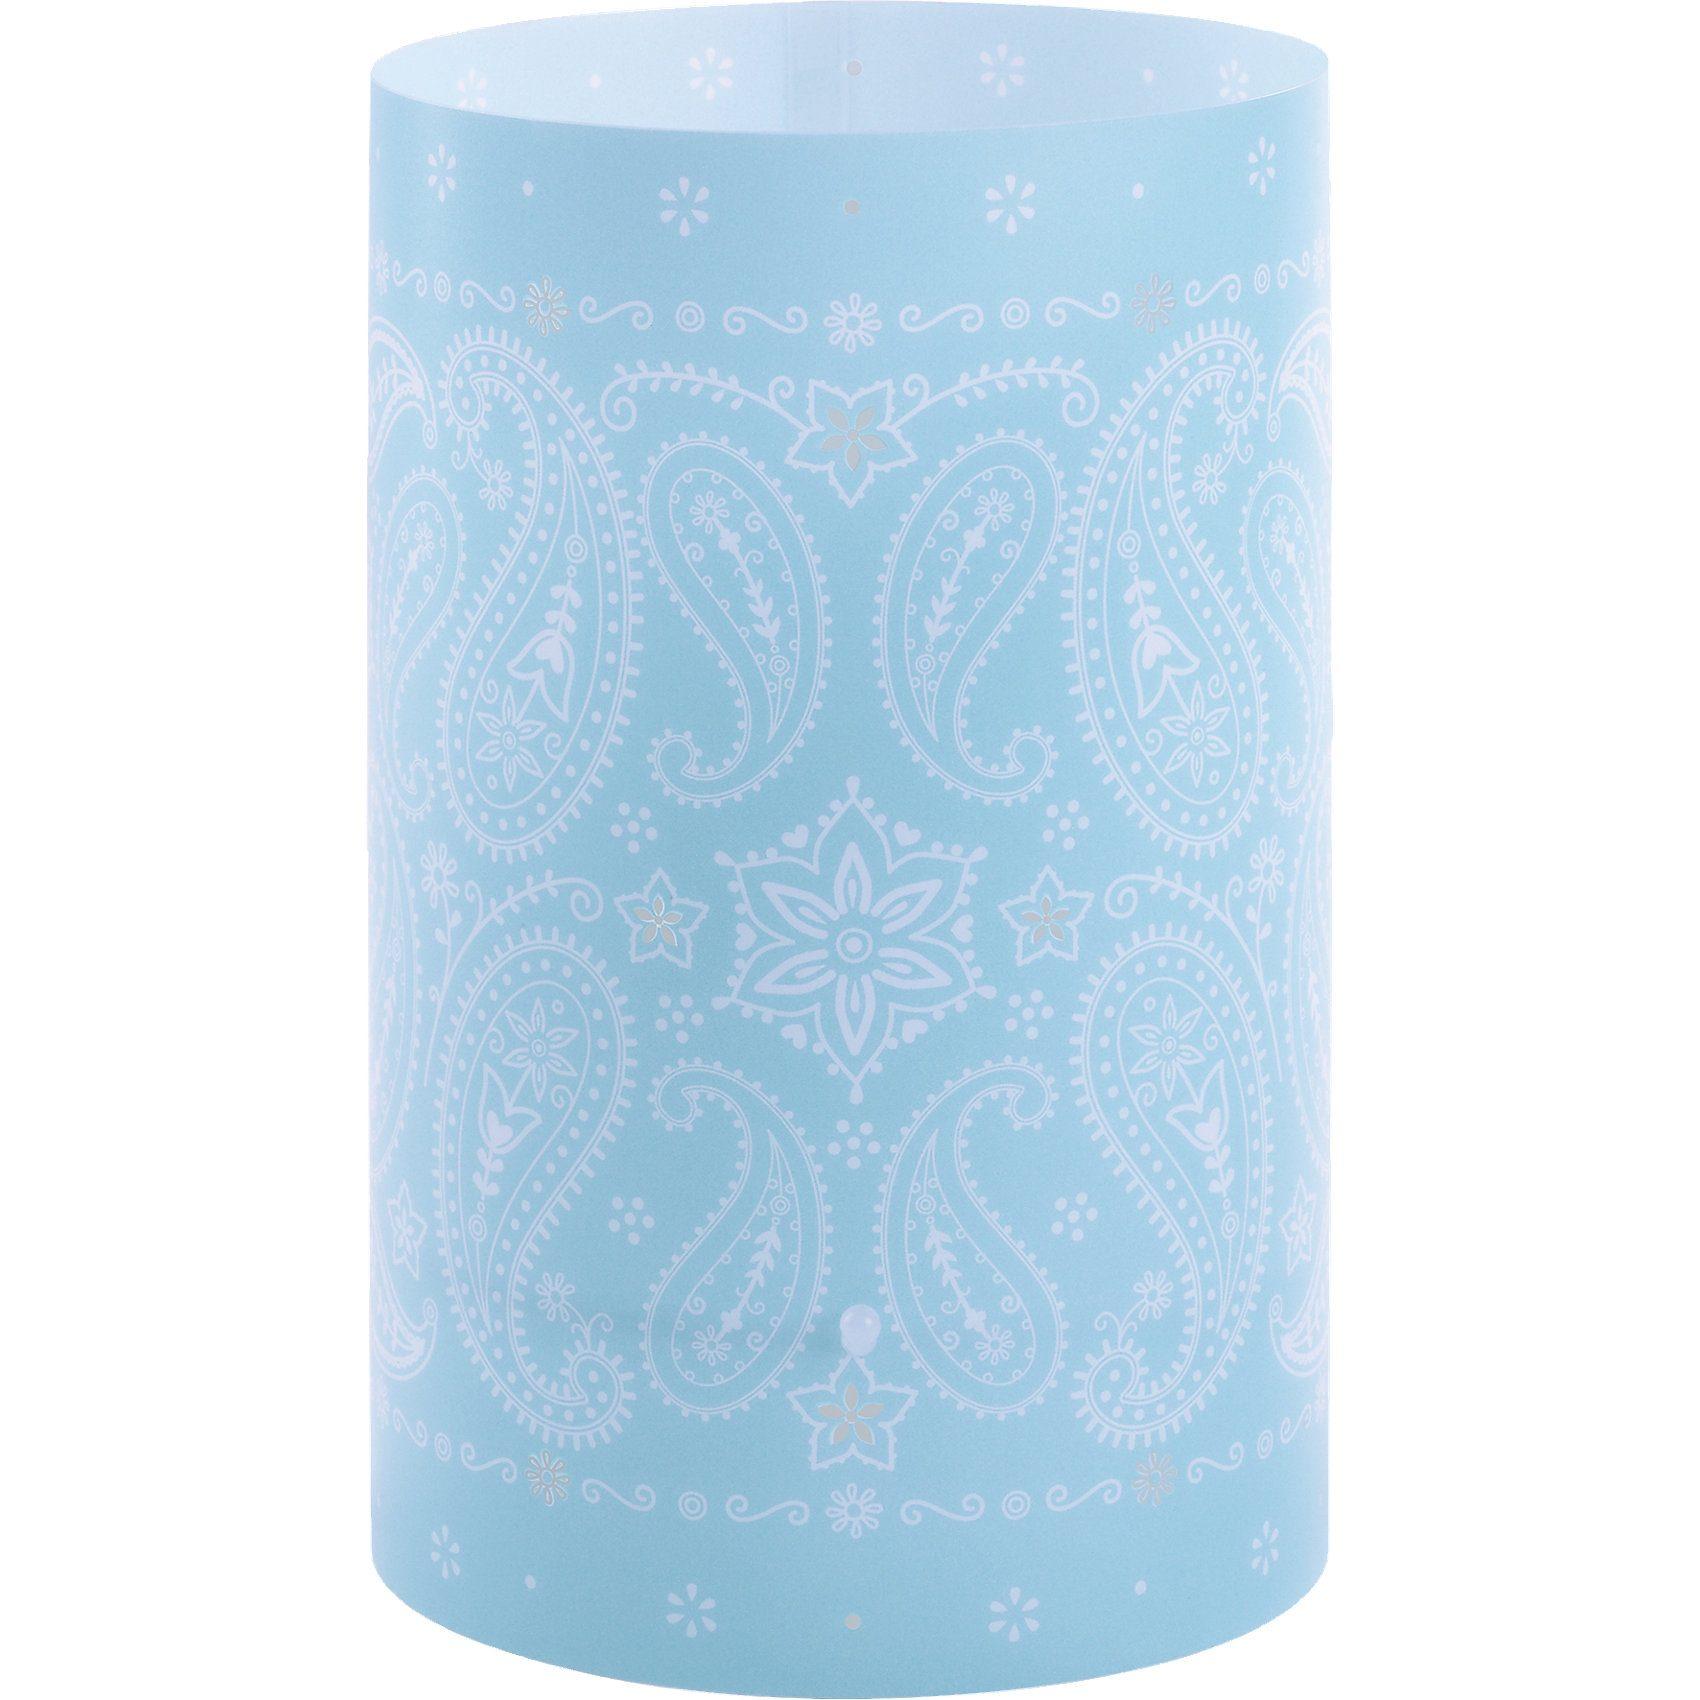 Dalber Tischlampe Ornamente, blau